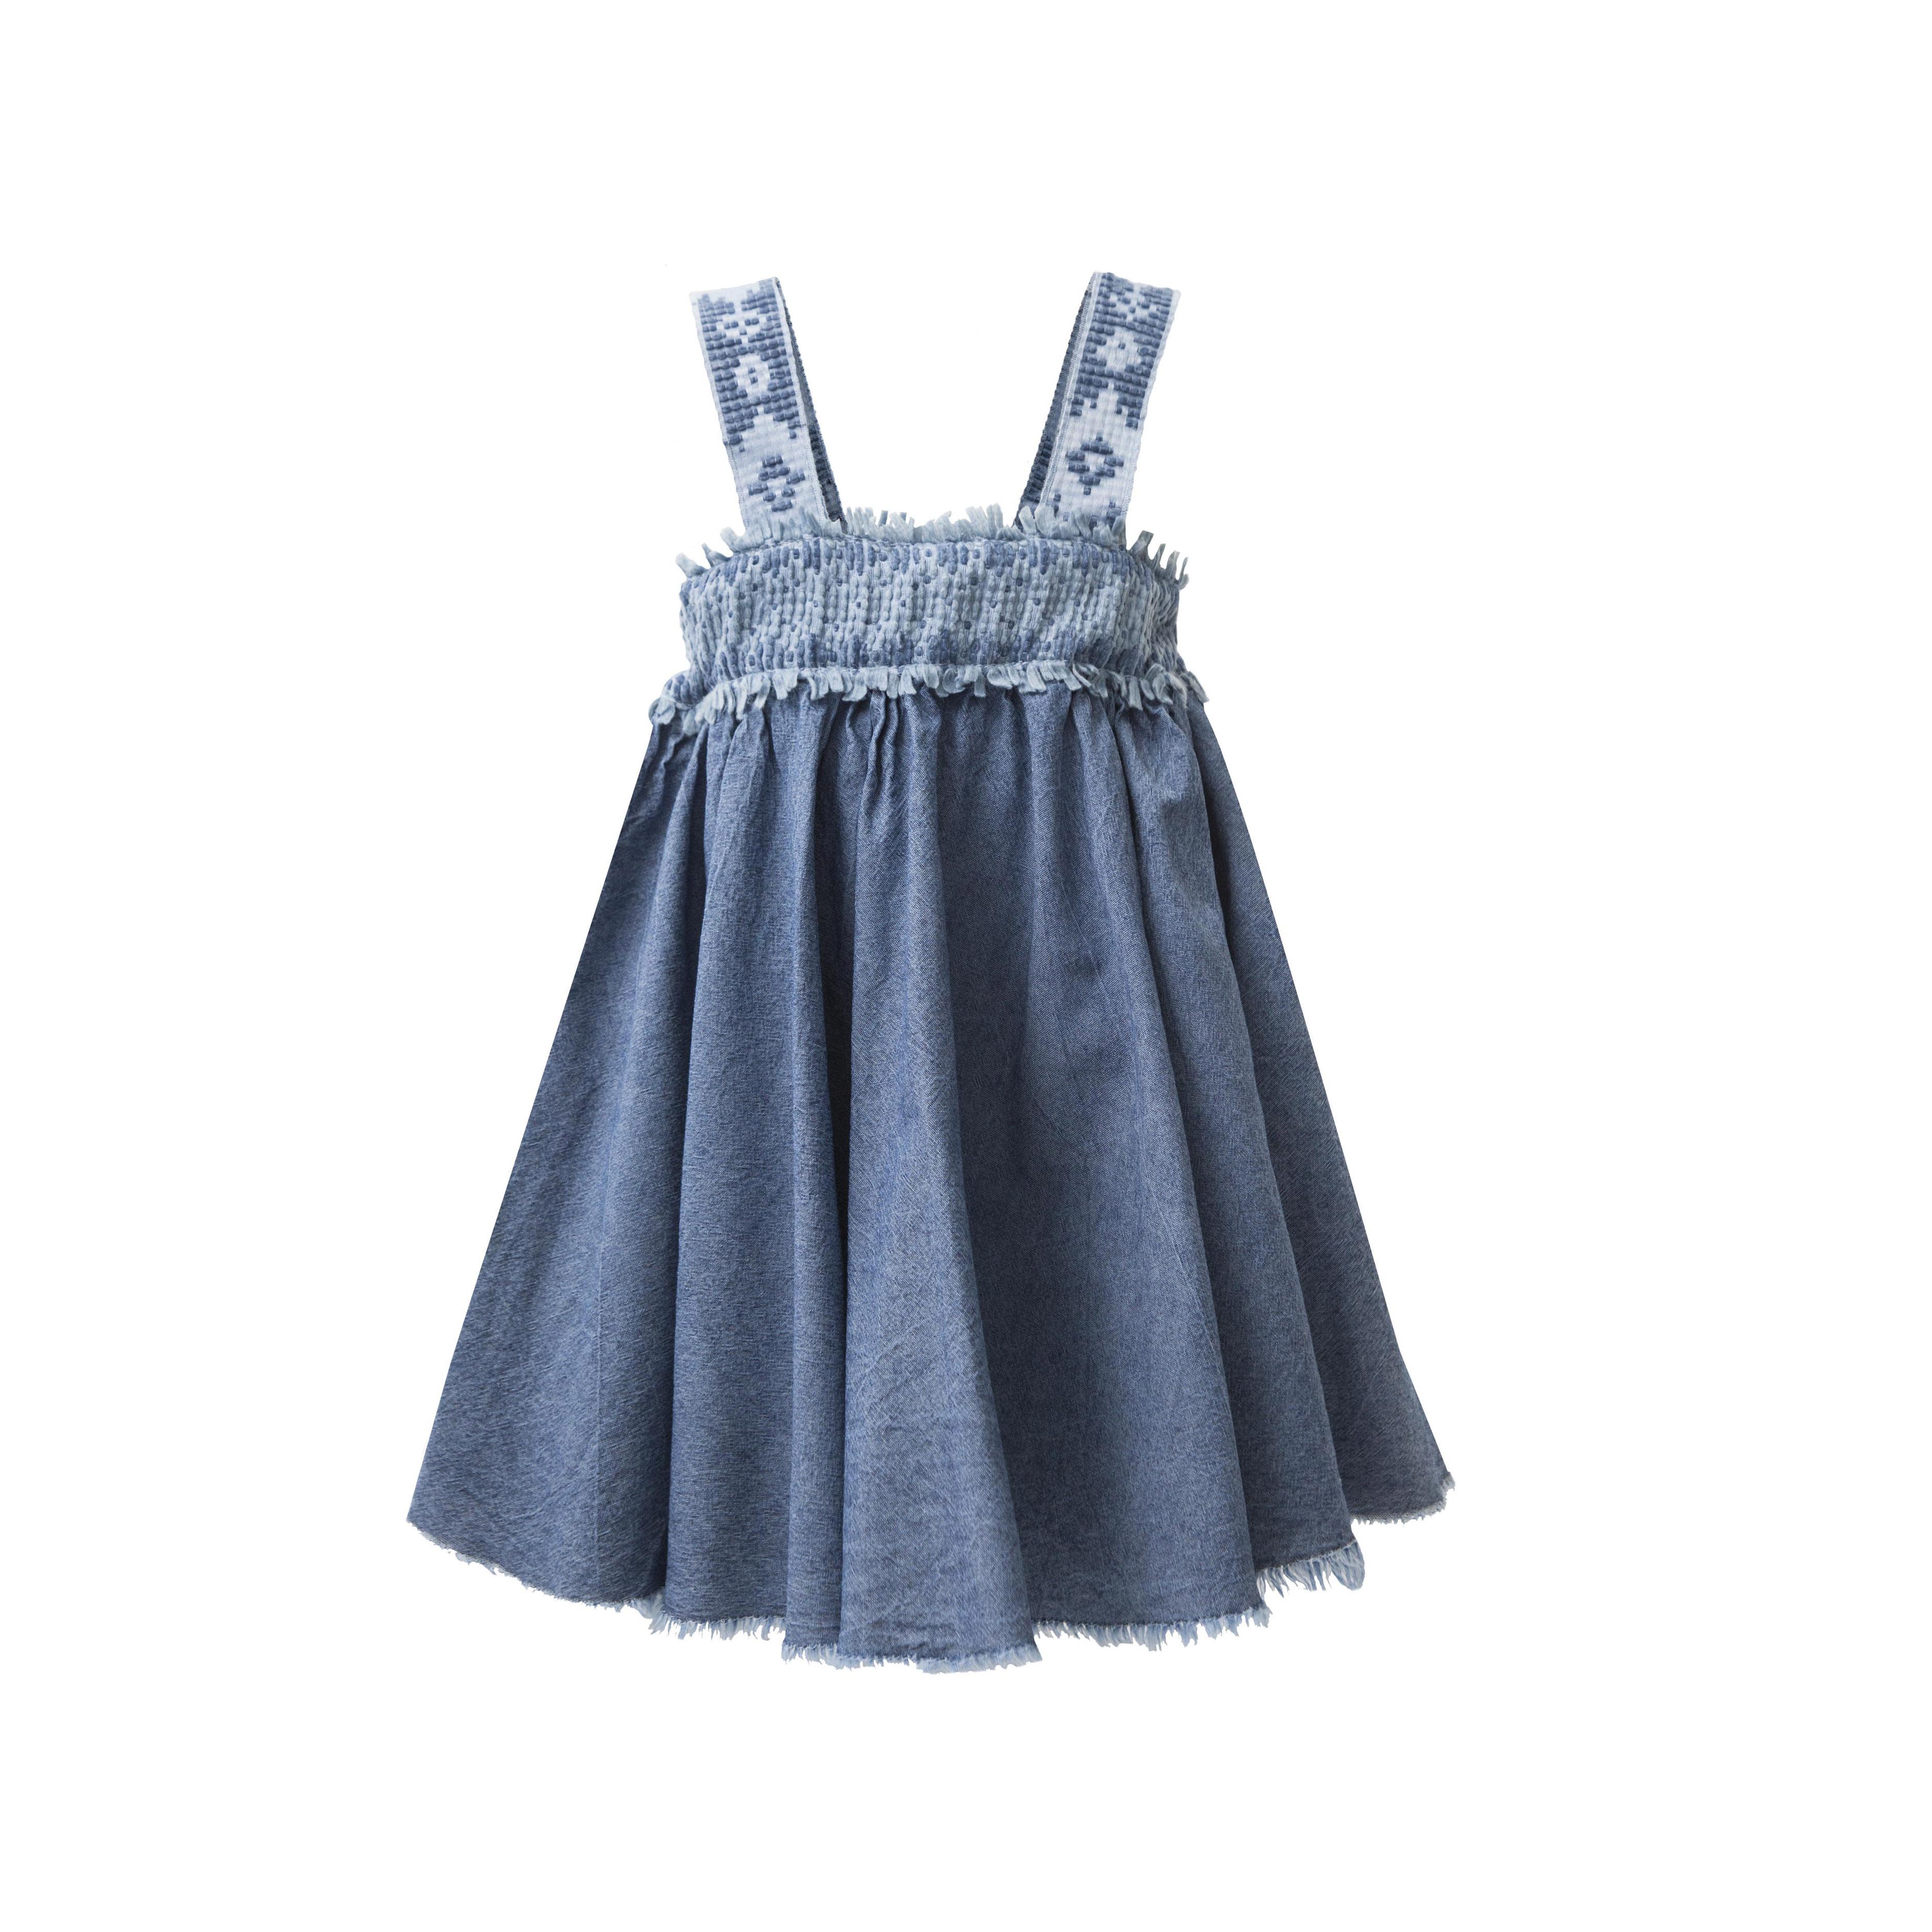 229e1be6cda6 Φόρεμα τζιν με φαρδιές τιράντες